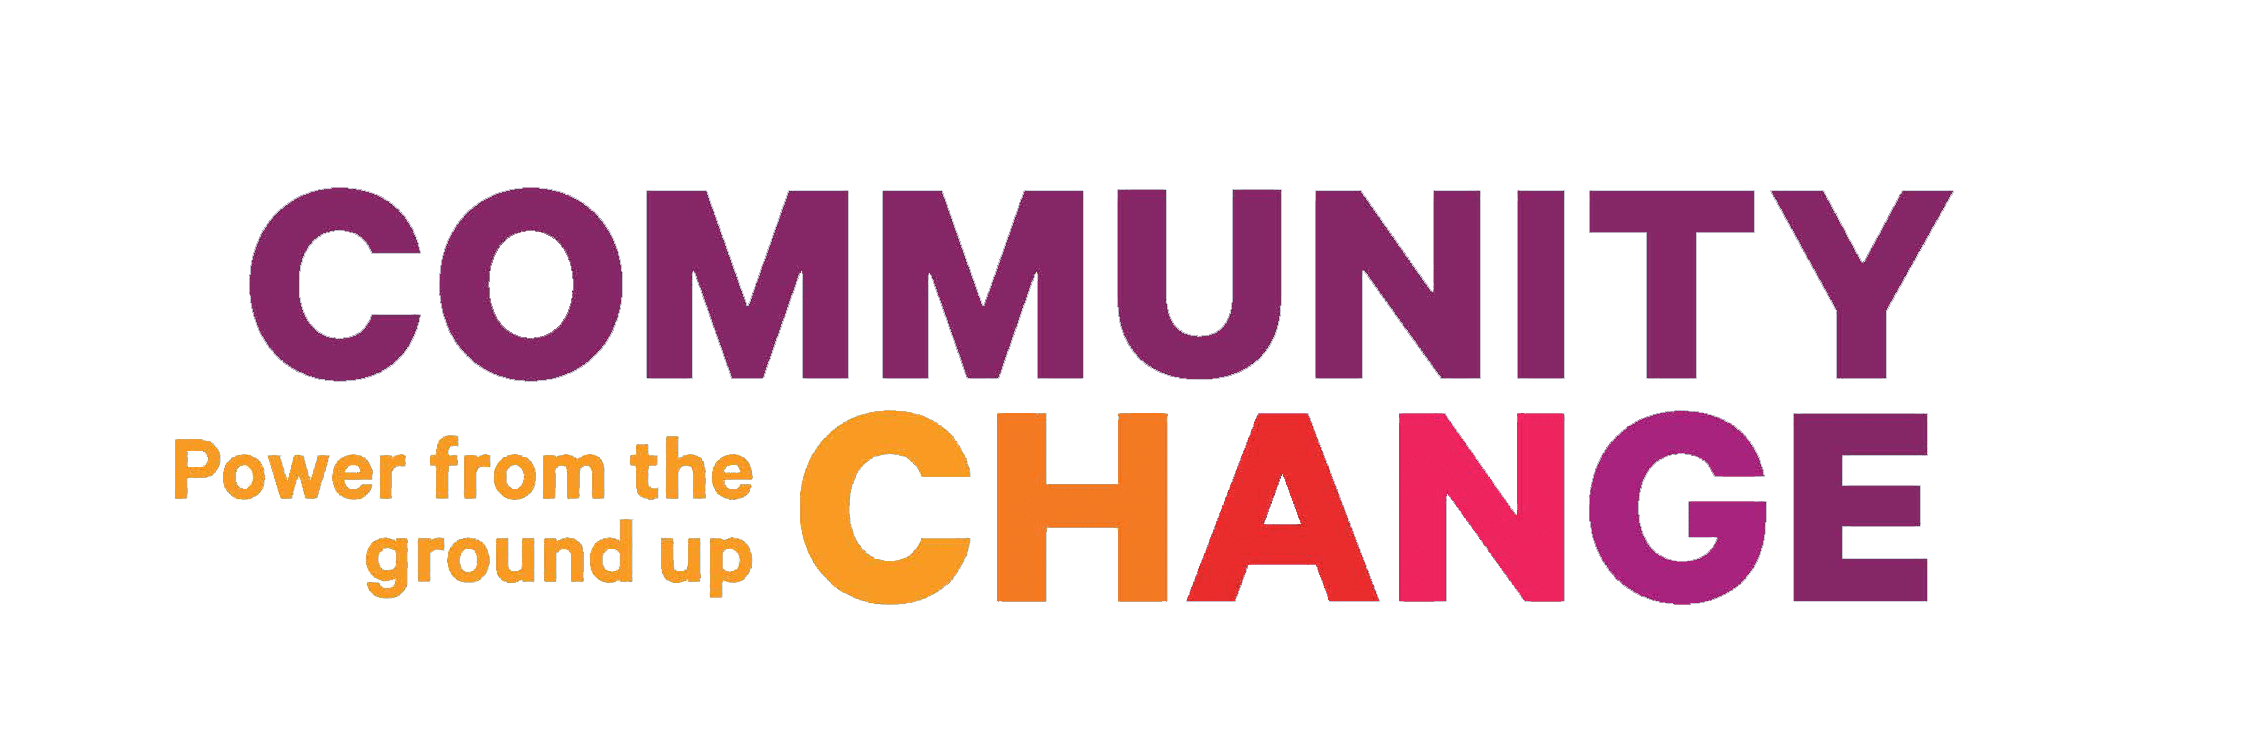 Community Change logo